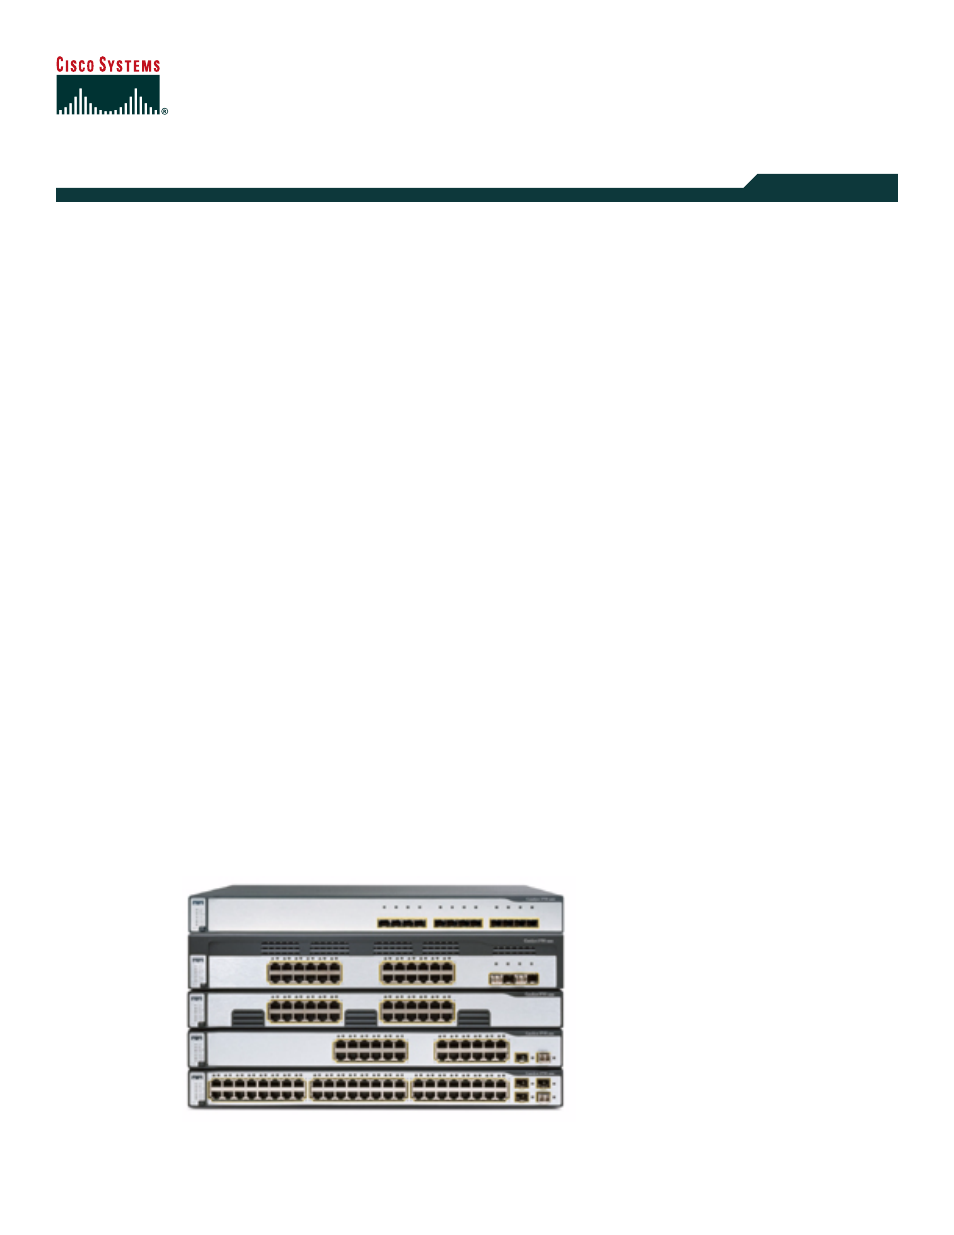 carrier access catalyst 3750 series user manual 18 pages rh manualsdir com cisco 3750g manual cisco 3750 v2 manual